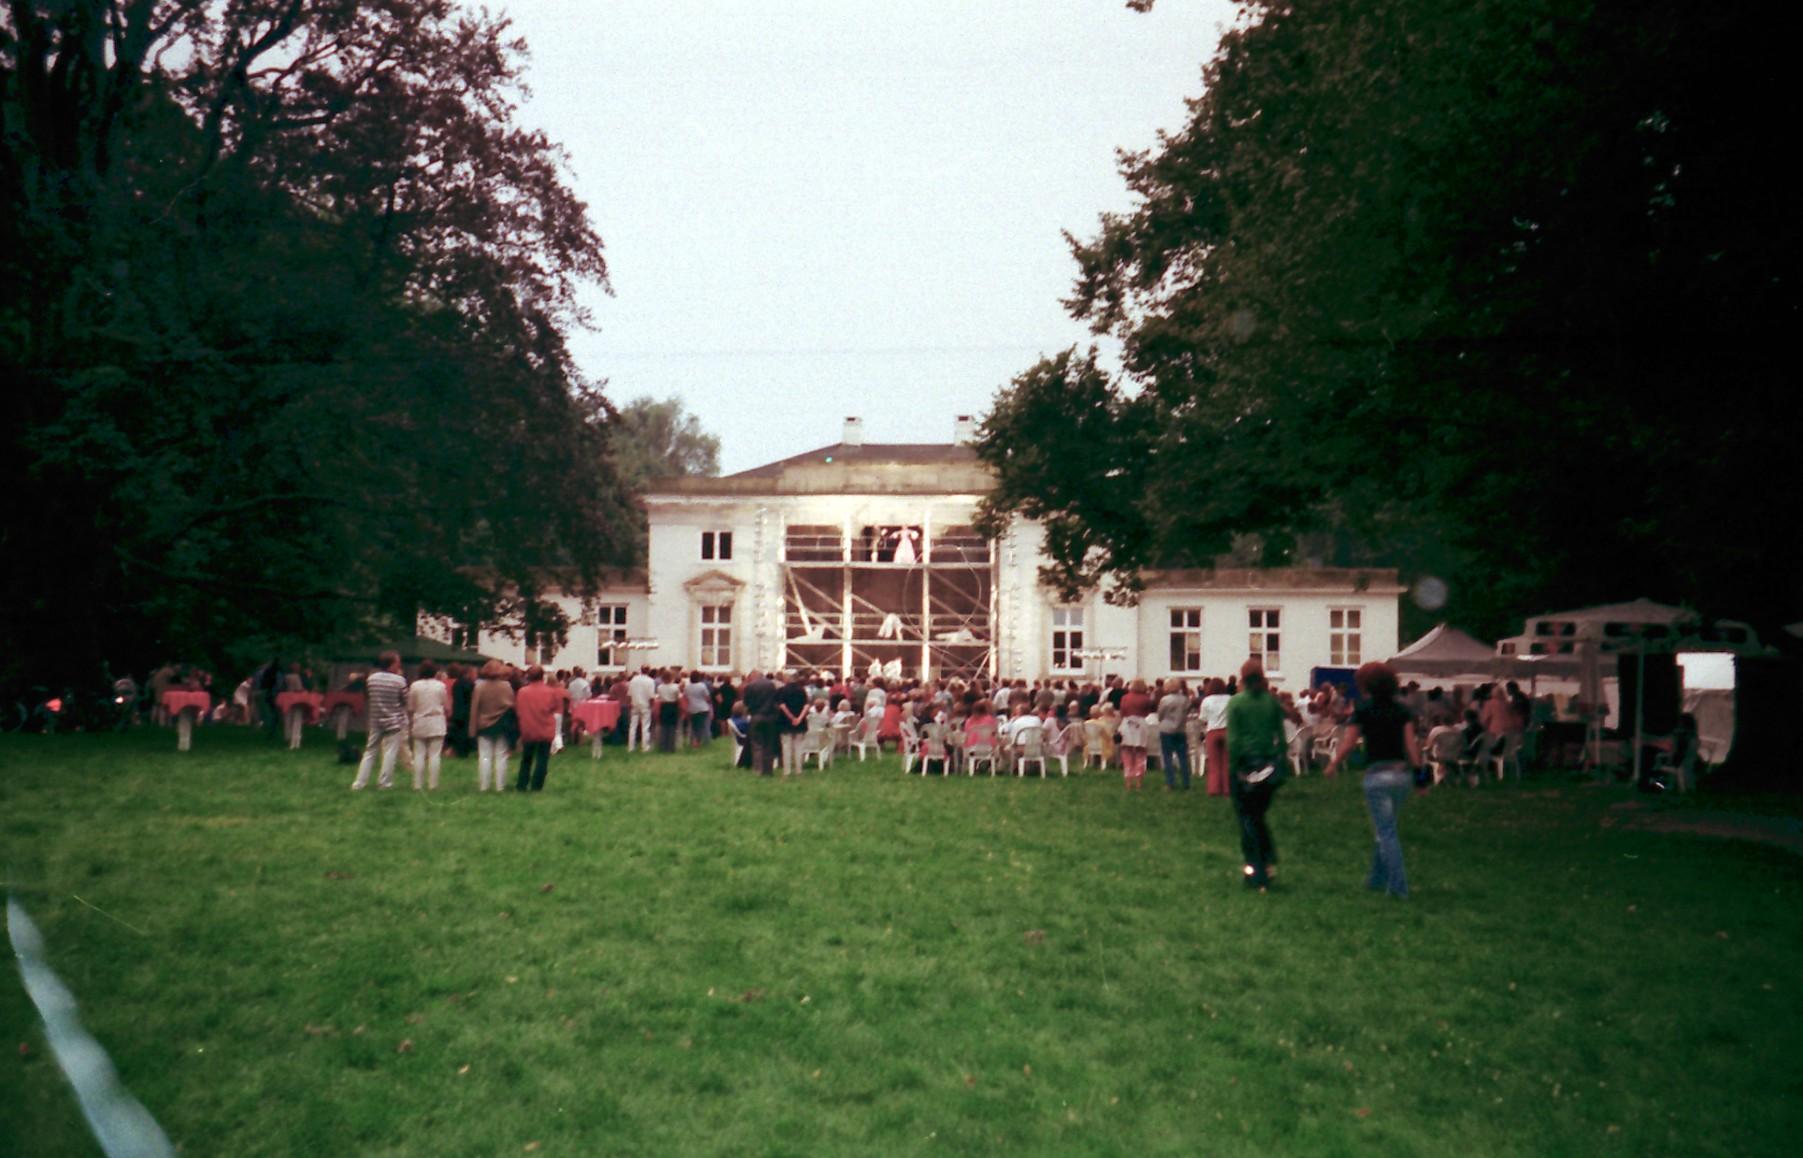 O&U 2002, 11-F-lolaroggeschule-oben-und-unten-2002